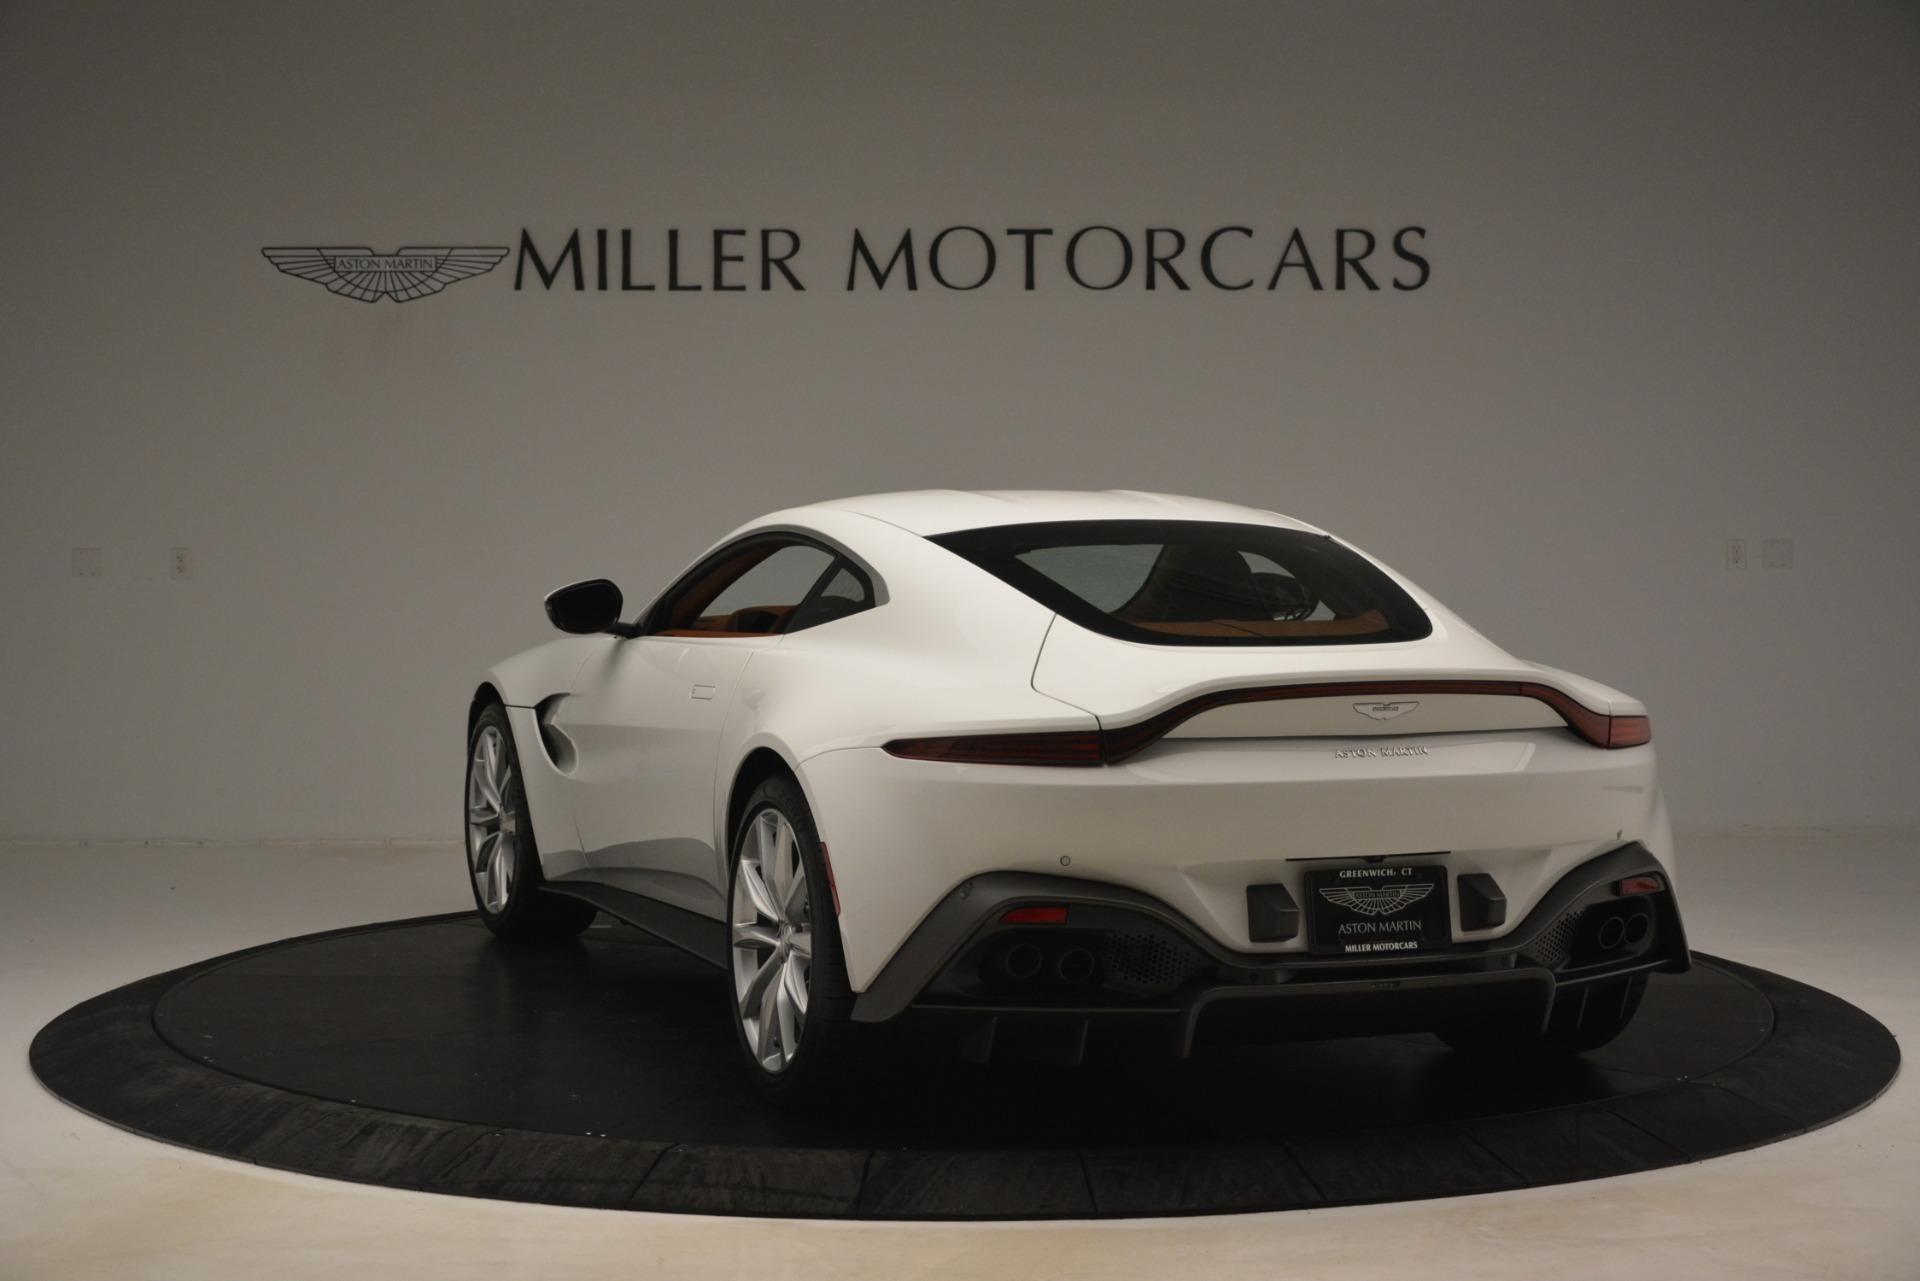 New 2019 Aston Martin Vantage Coupe For Sale In Greenwich, CT. Alfa Romeo of Greenwich, A1373 3227_p4